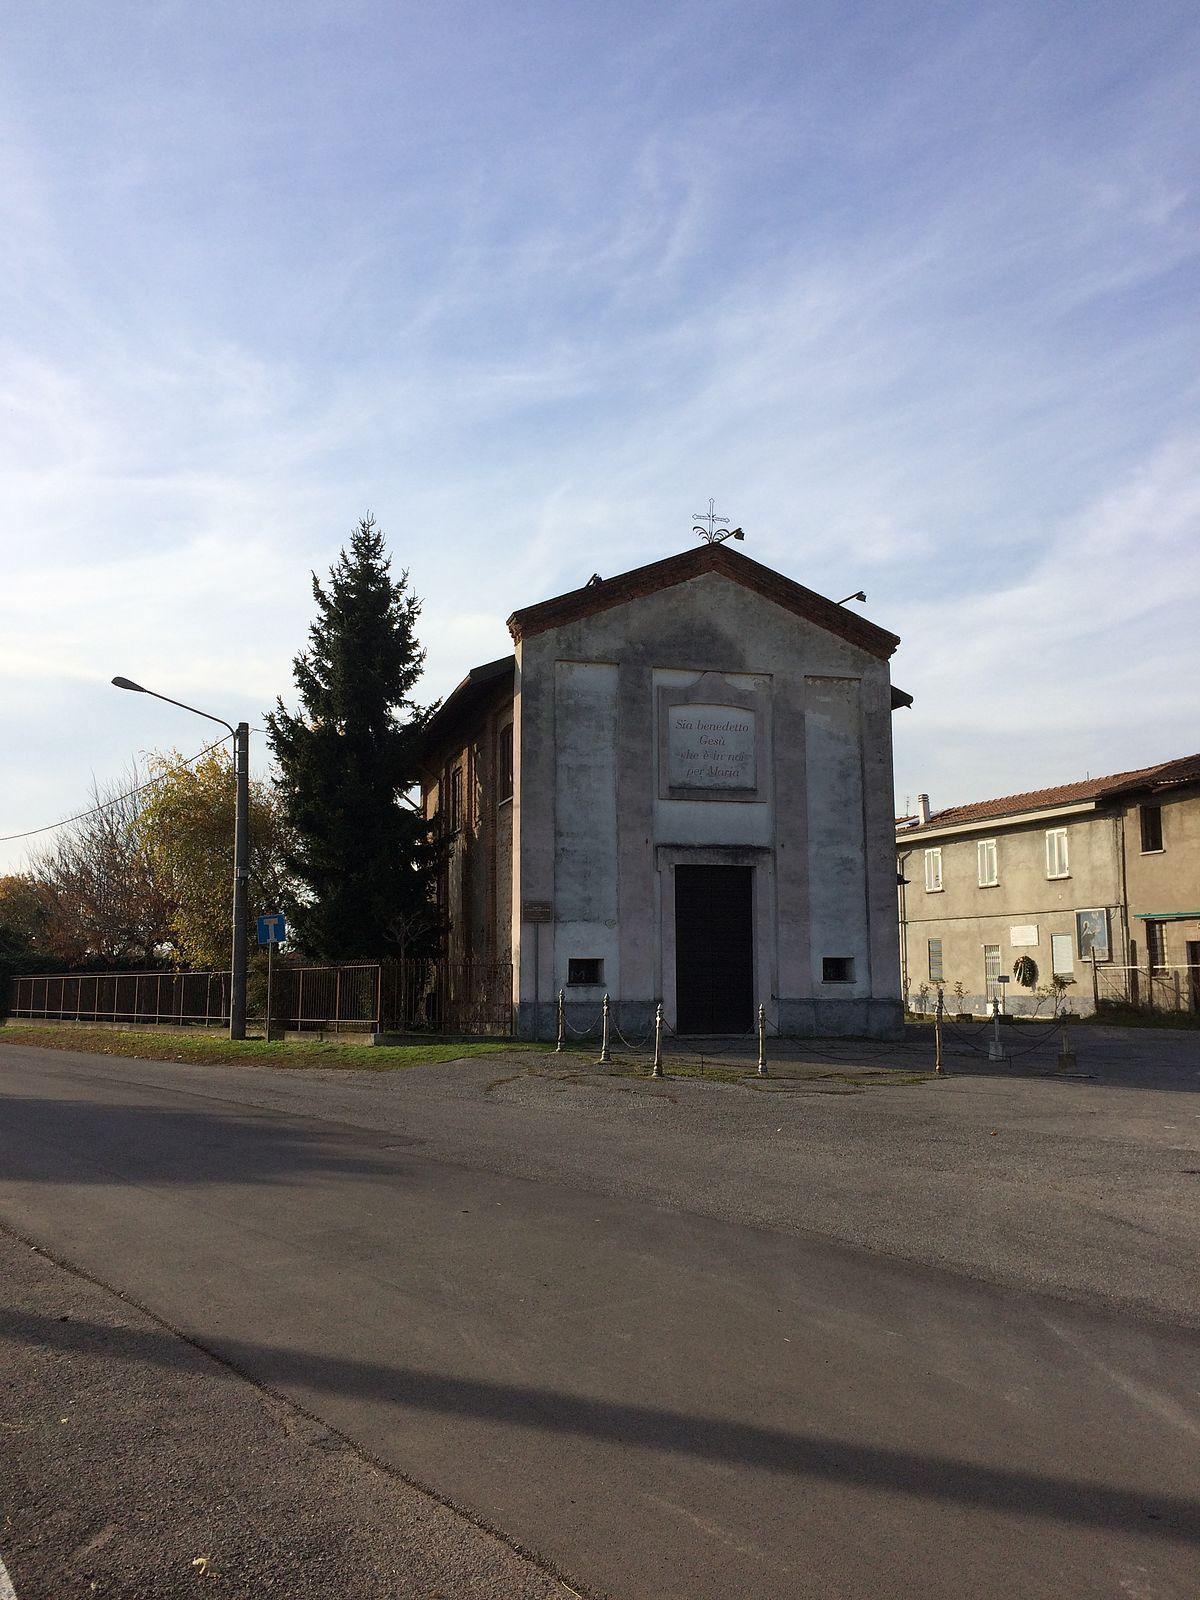 Chiesa di santa teresa d 39 vila wikipedia for 3 case di storia in california